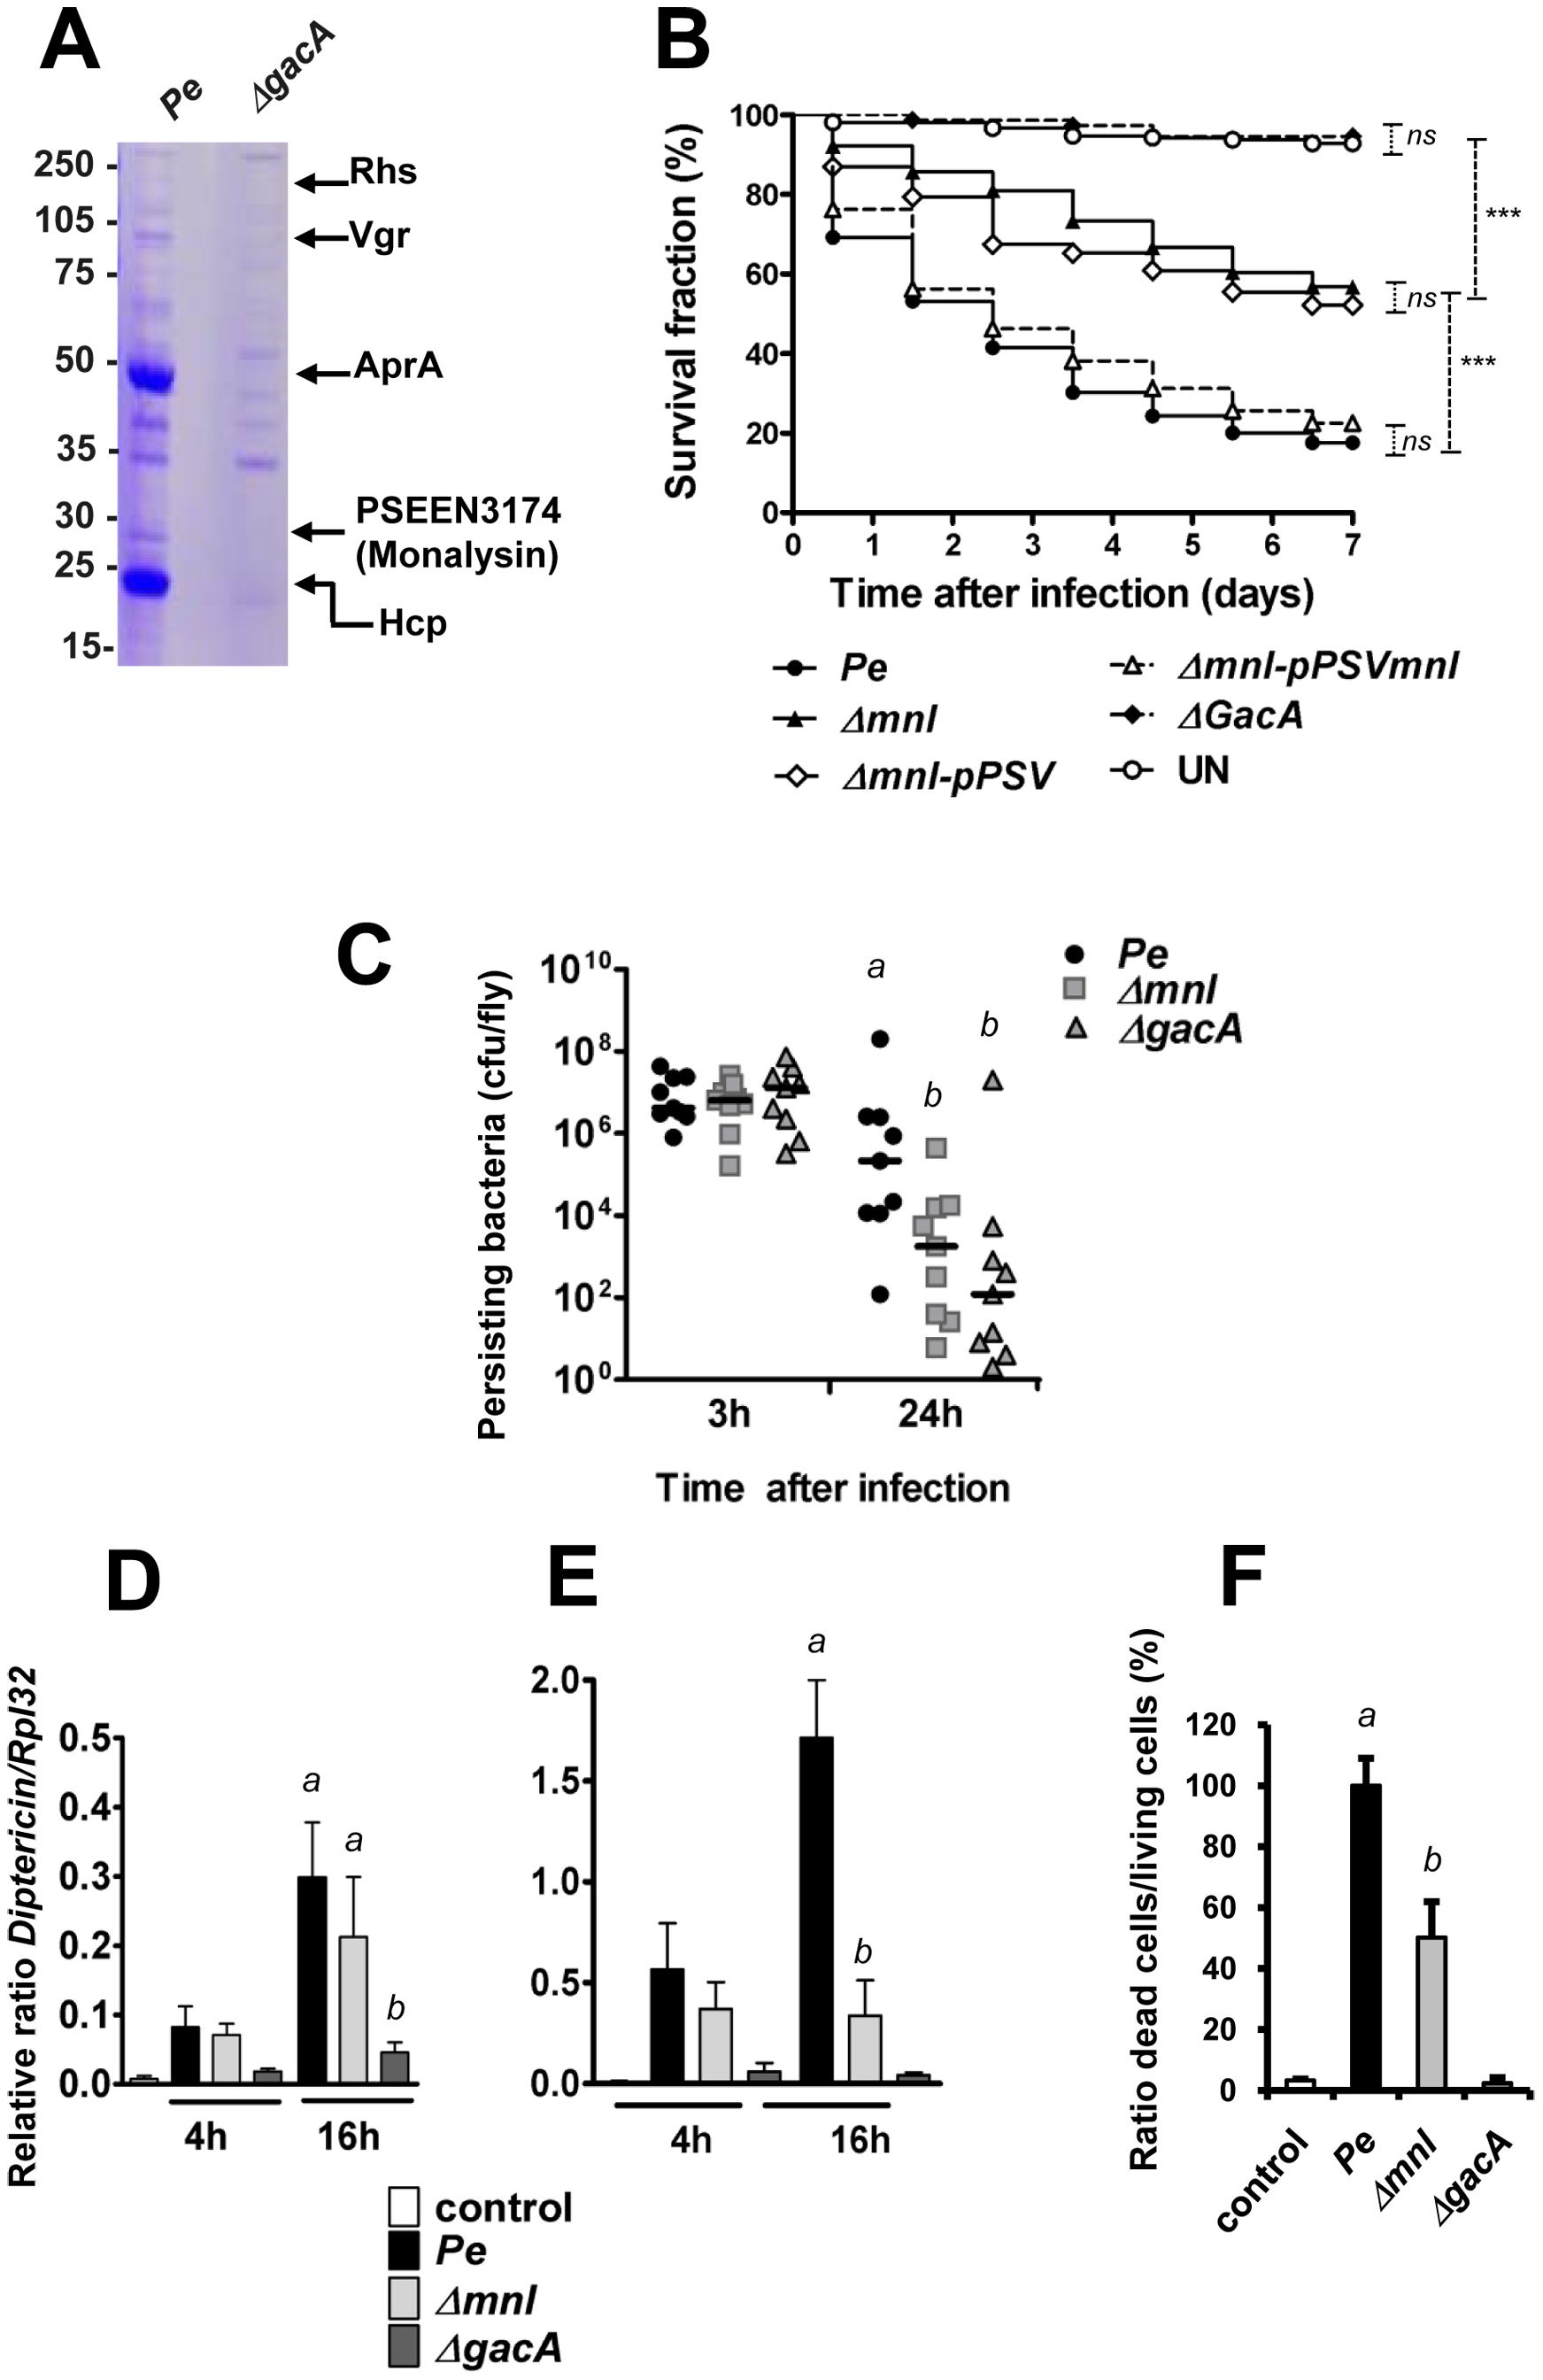 PSEEN3174 encodes a secreted protein, Monalysin, required for <i>P. entomophila</i> virulence.